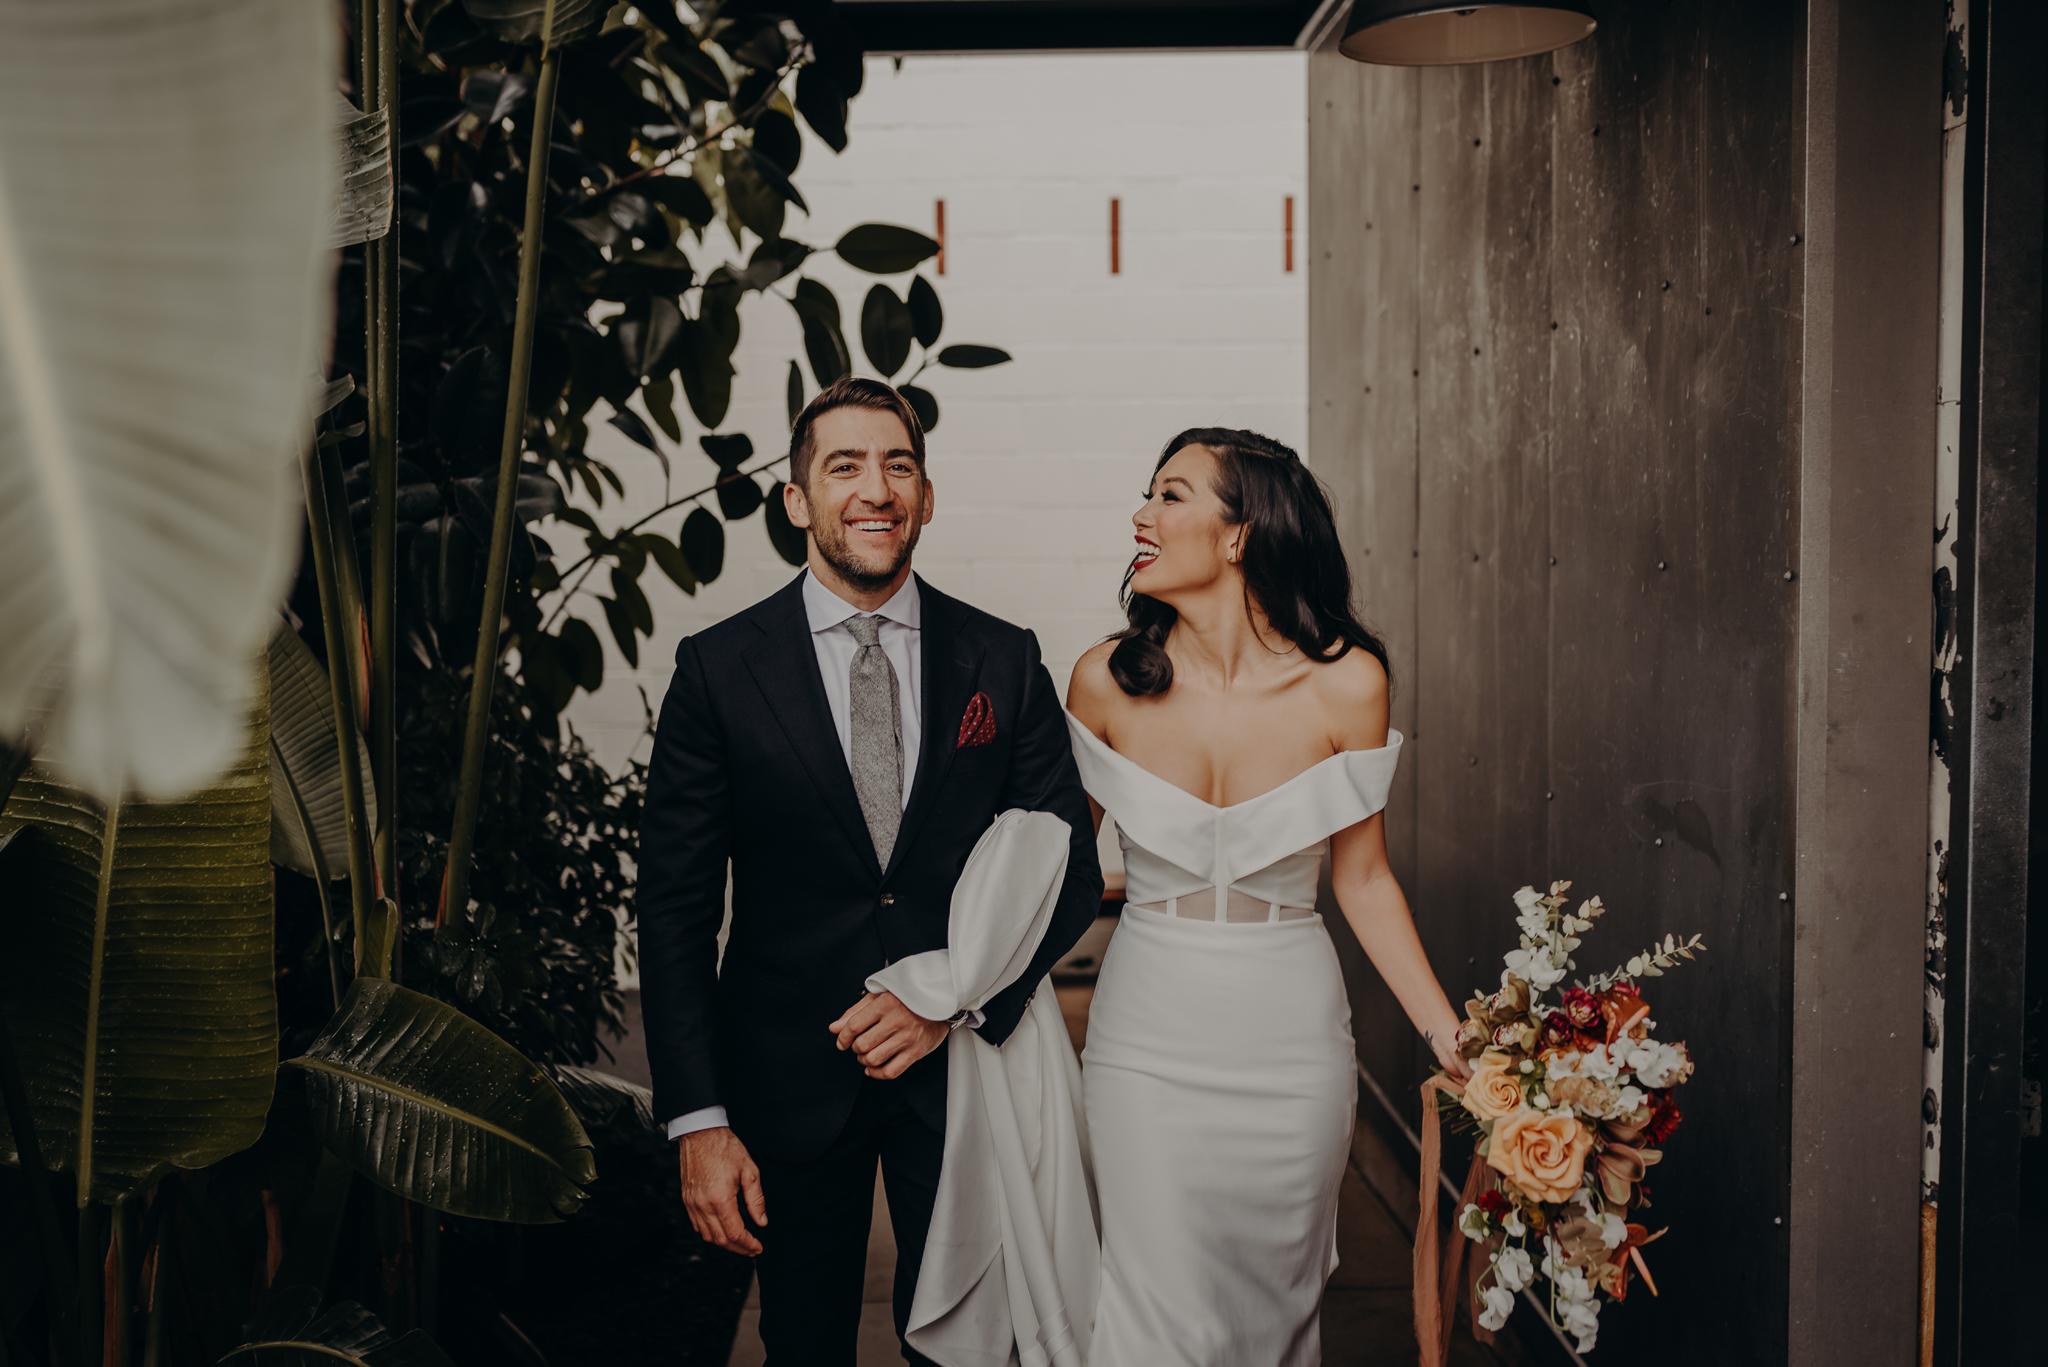 Wedding Photo LA - wedding photographer in los angeles - millwick wedding venue -isaiahandtaylor.com-062.jpg